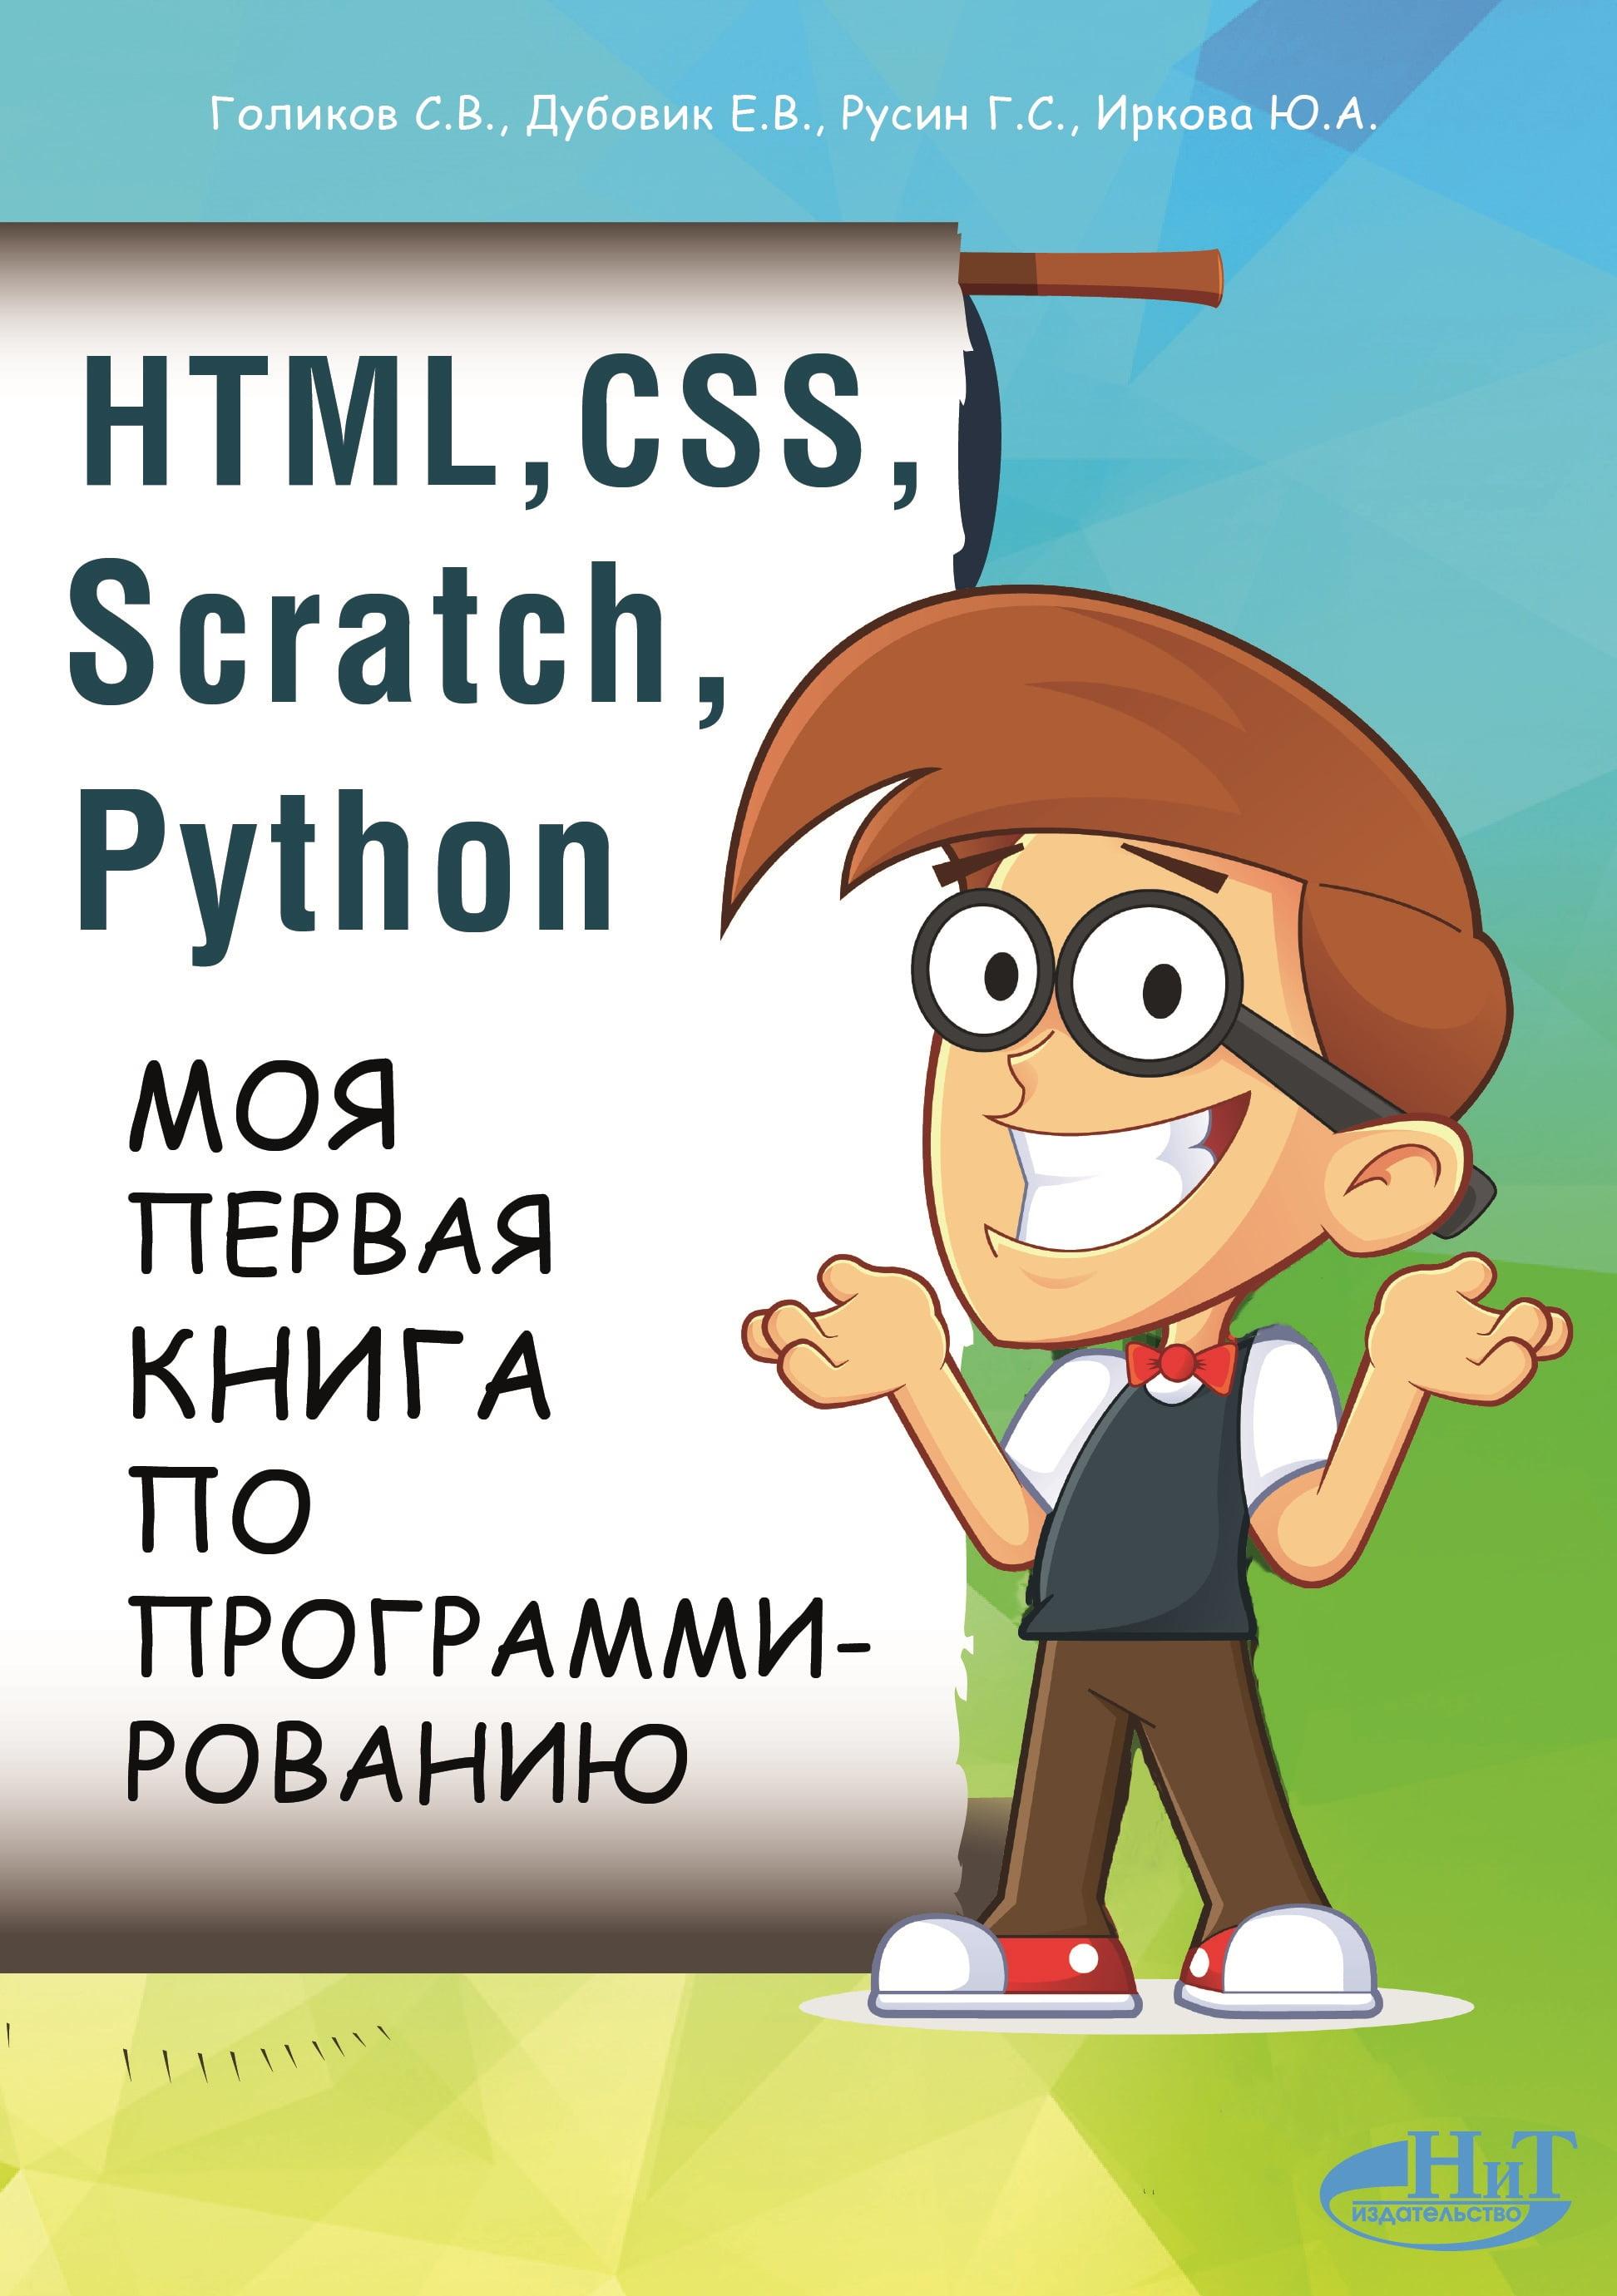 HTML%2C+CSS%2C+Scratch%2C+Python.+%D0%9C%D0%BE%D1%8F+%D0%BF%D0%B5%D1%80%D0%B2%D0%B0%D1%8F+%D0%BA%D0%BD%D0%B8%D0%B3%D0%B0 - фото 1